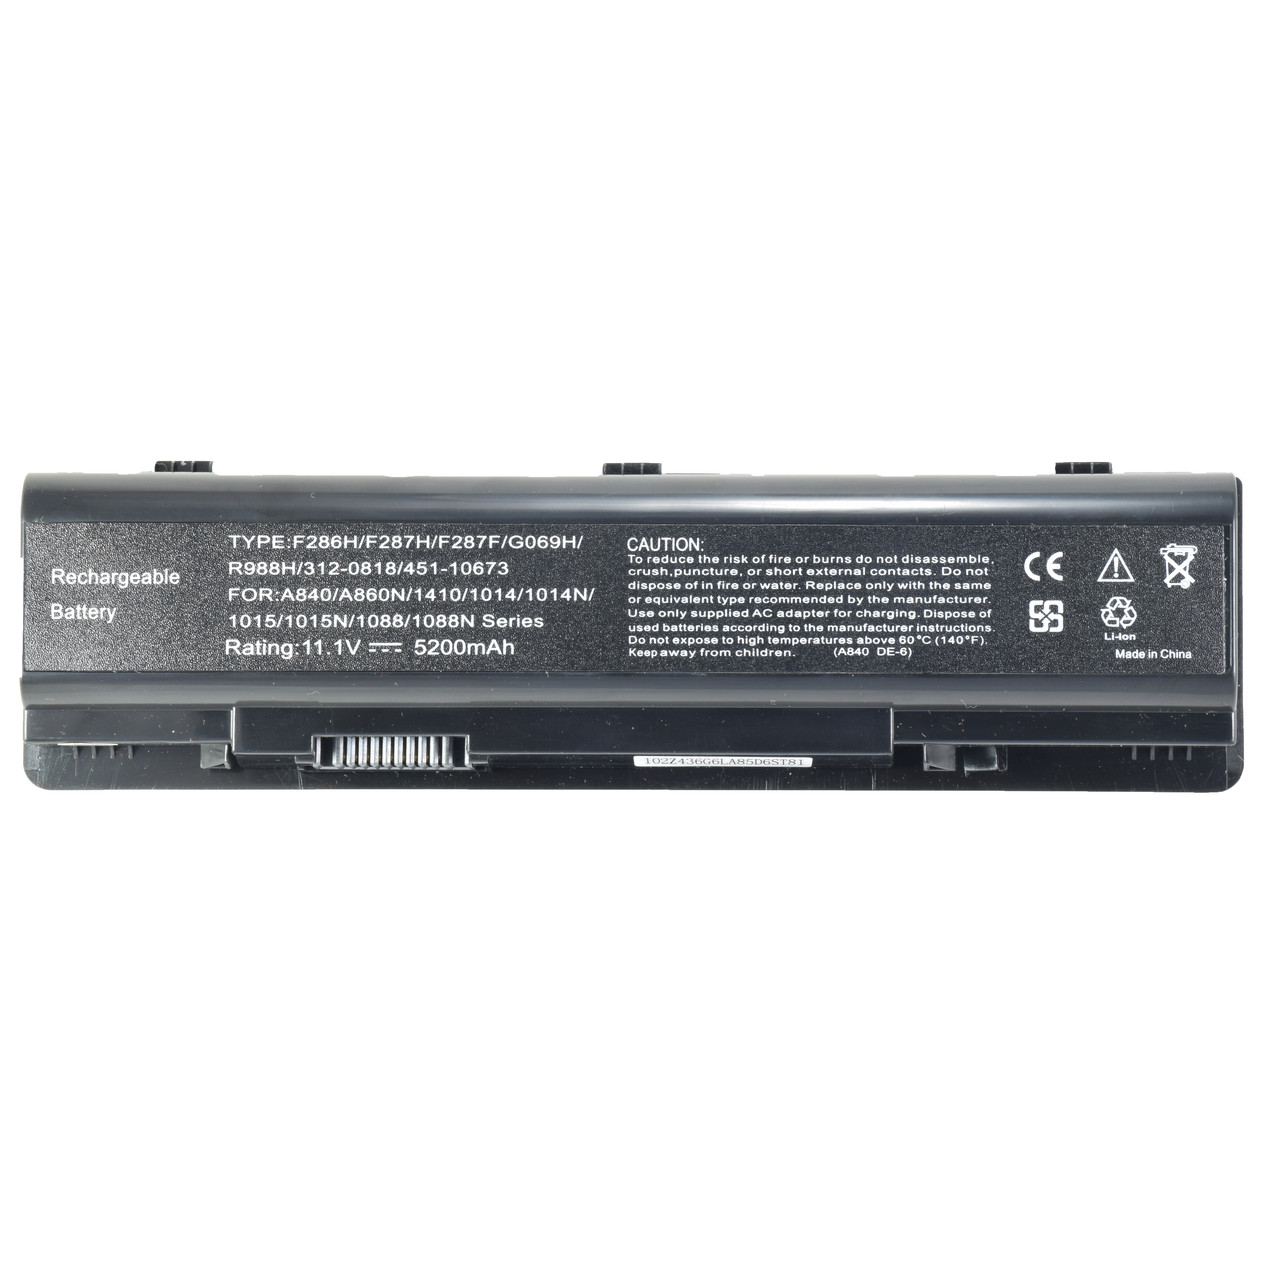 Батарея для ноутбука DELL Inspiron 1410 1014 1014n 1015 1015n 1088 1088n A840 A860 A860n Series